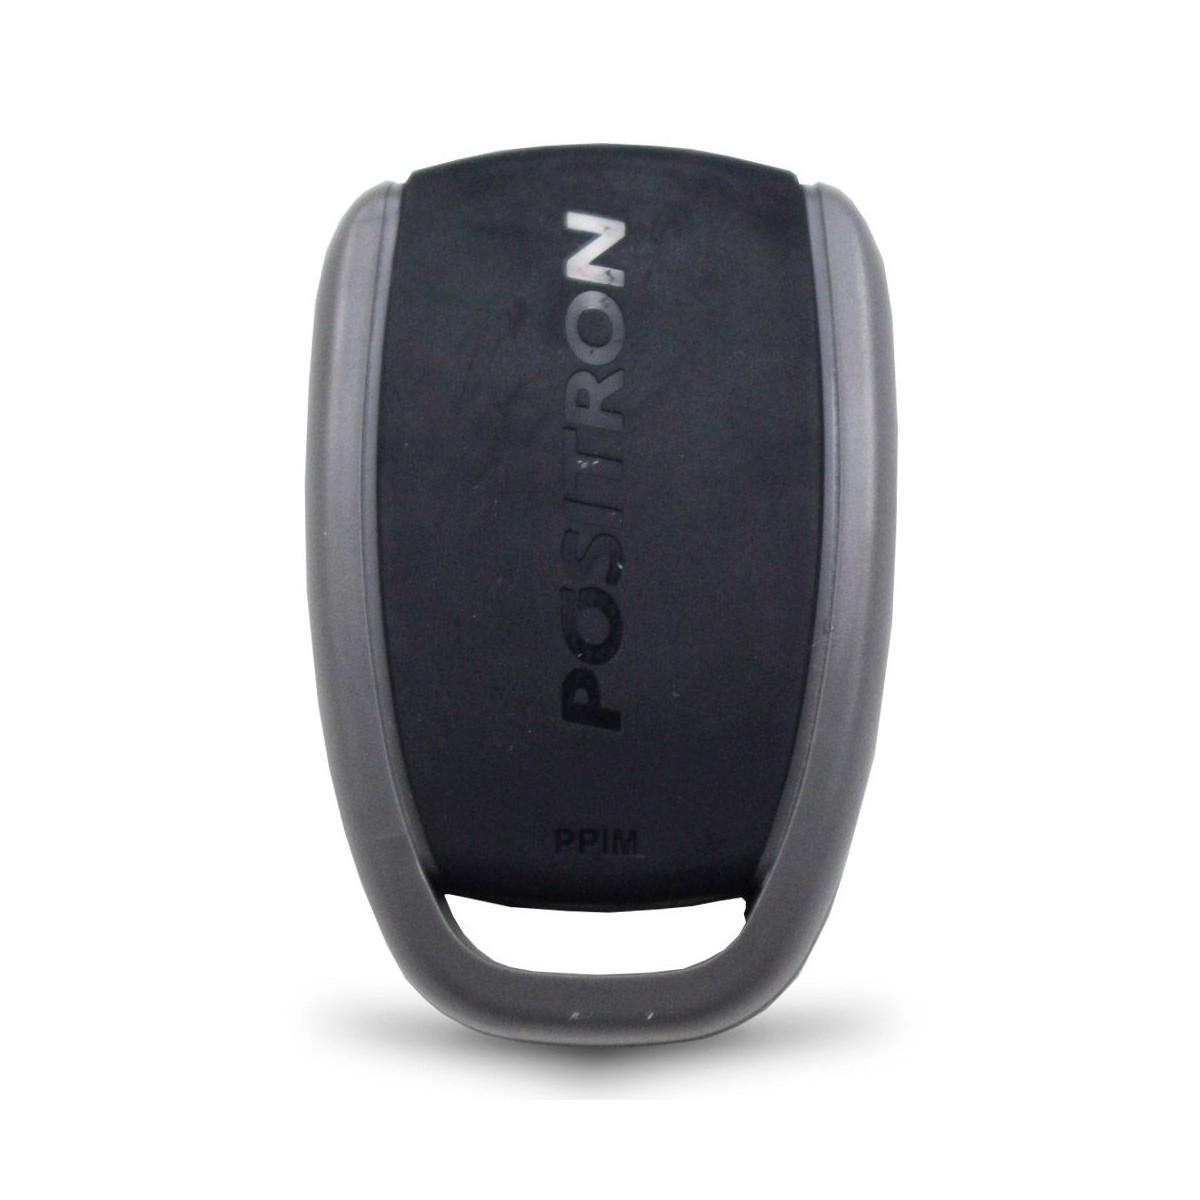 Controle Remoto Presença Alarme Positron Dpn72| Ex Fx Px Tx Duoblock G6 G7 G8